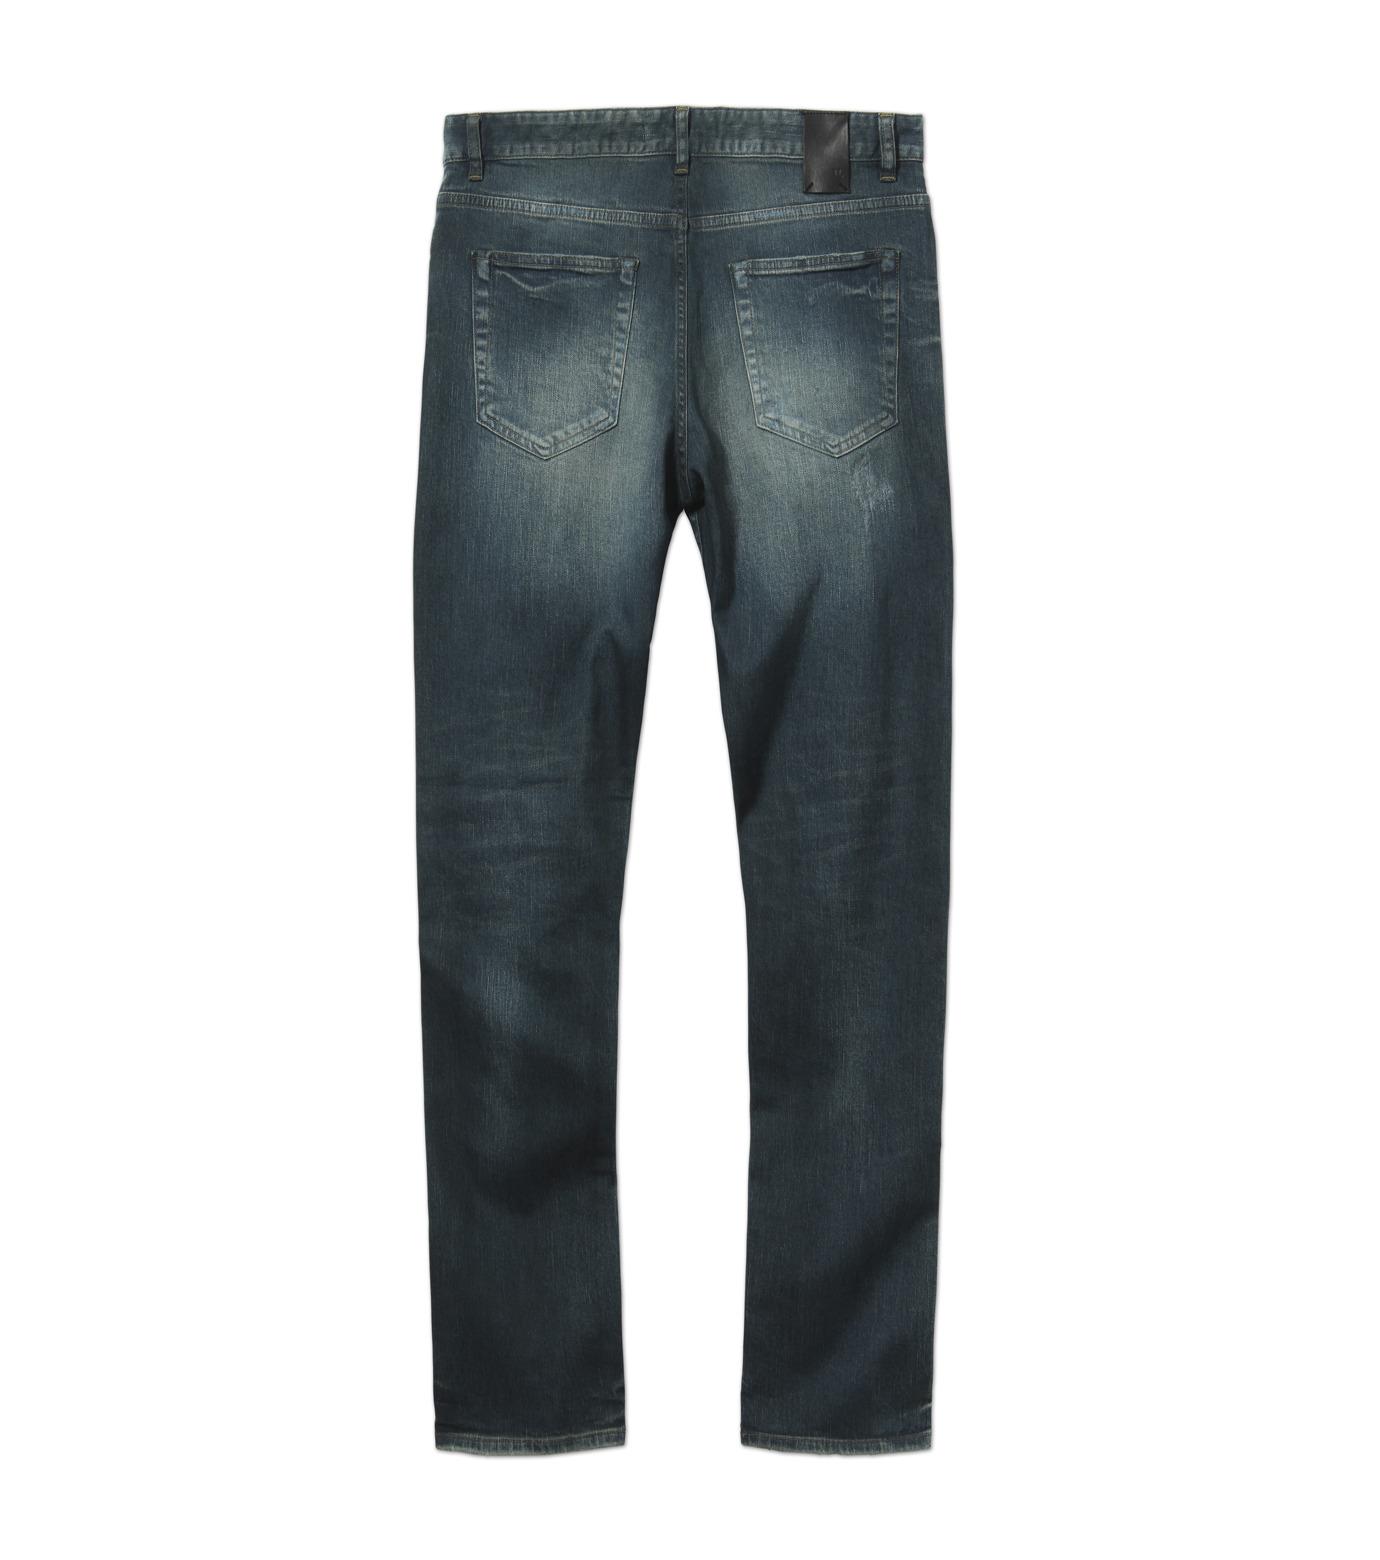 HL HEDDIE LOVU(エイチエル・エディールーヴ)のIND Dark Damage-INDIGO(パンツ/pants)-17A98006-94 拡大詳細画像5